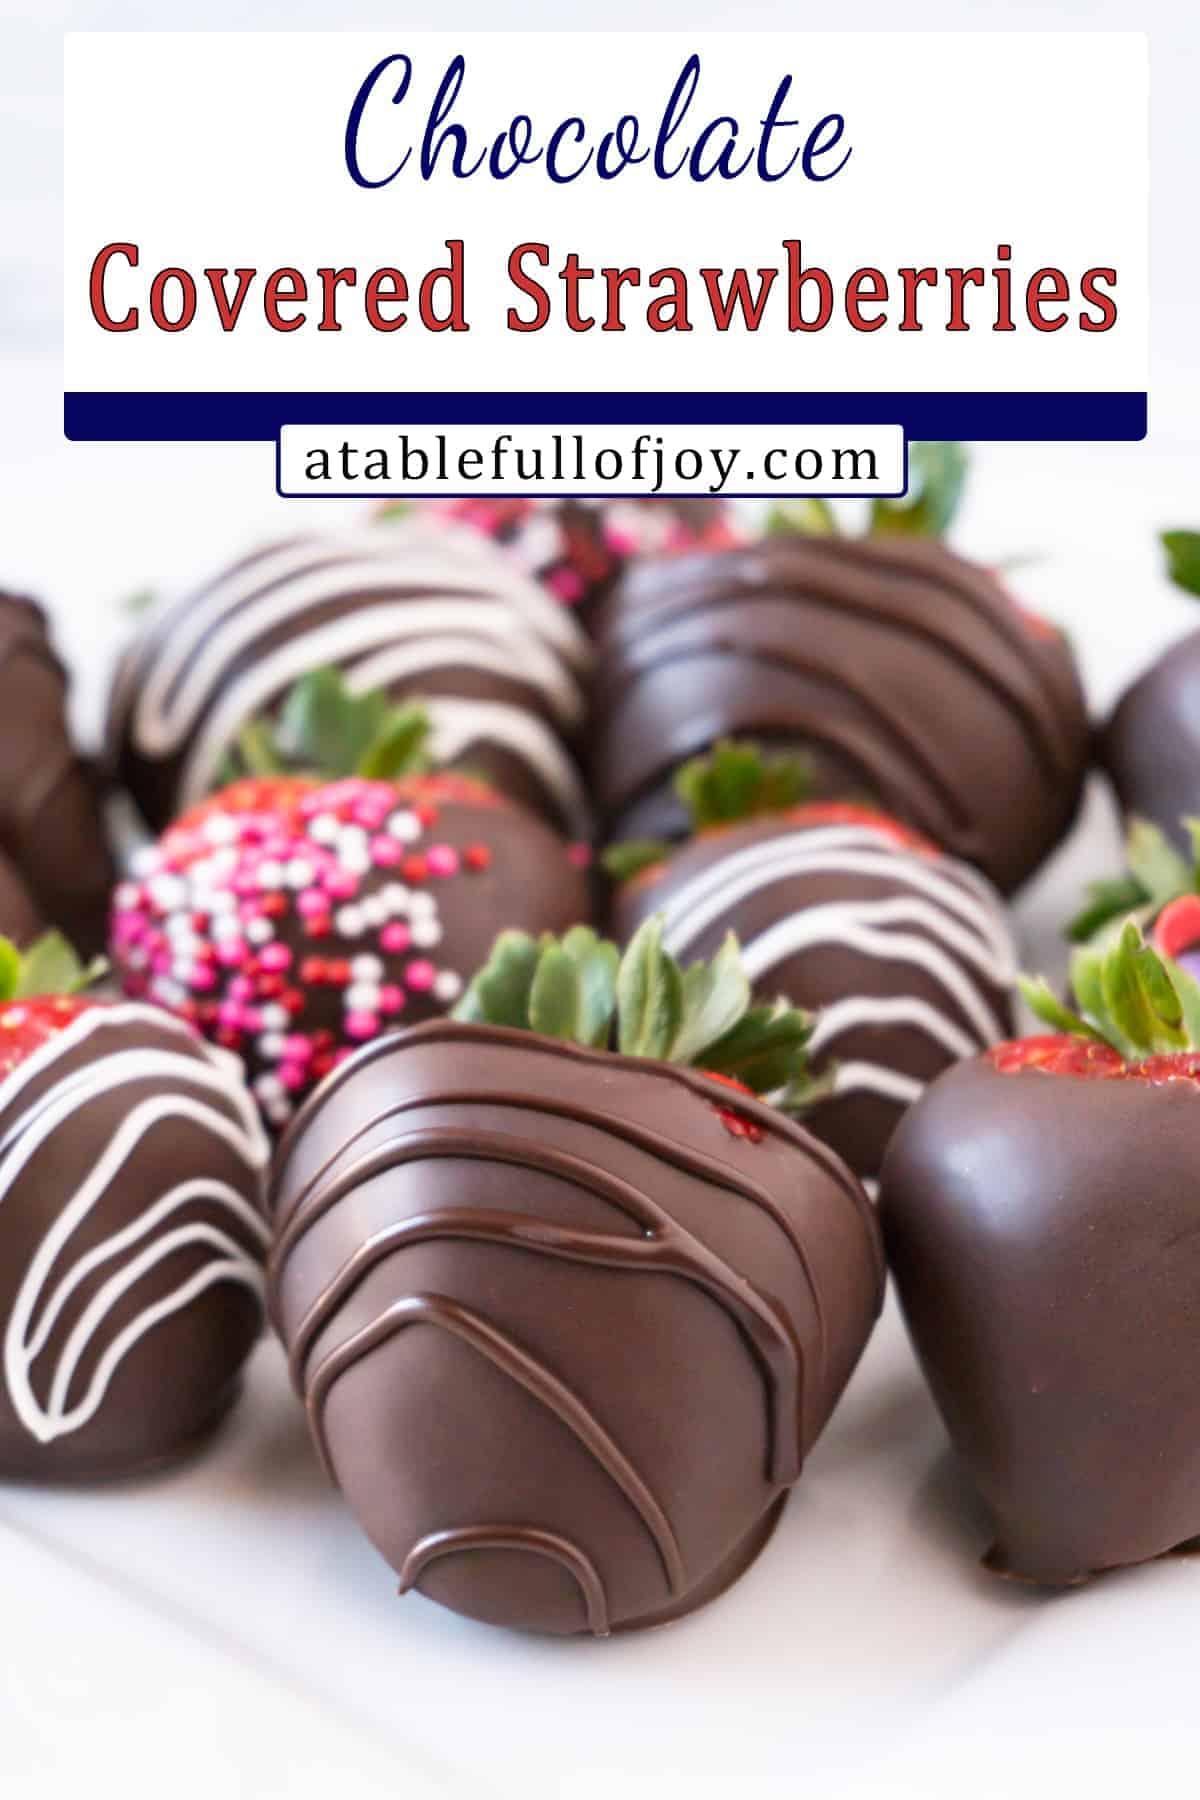 chocolate covered strawberries pinterest pin